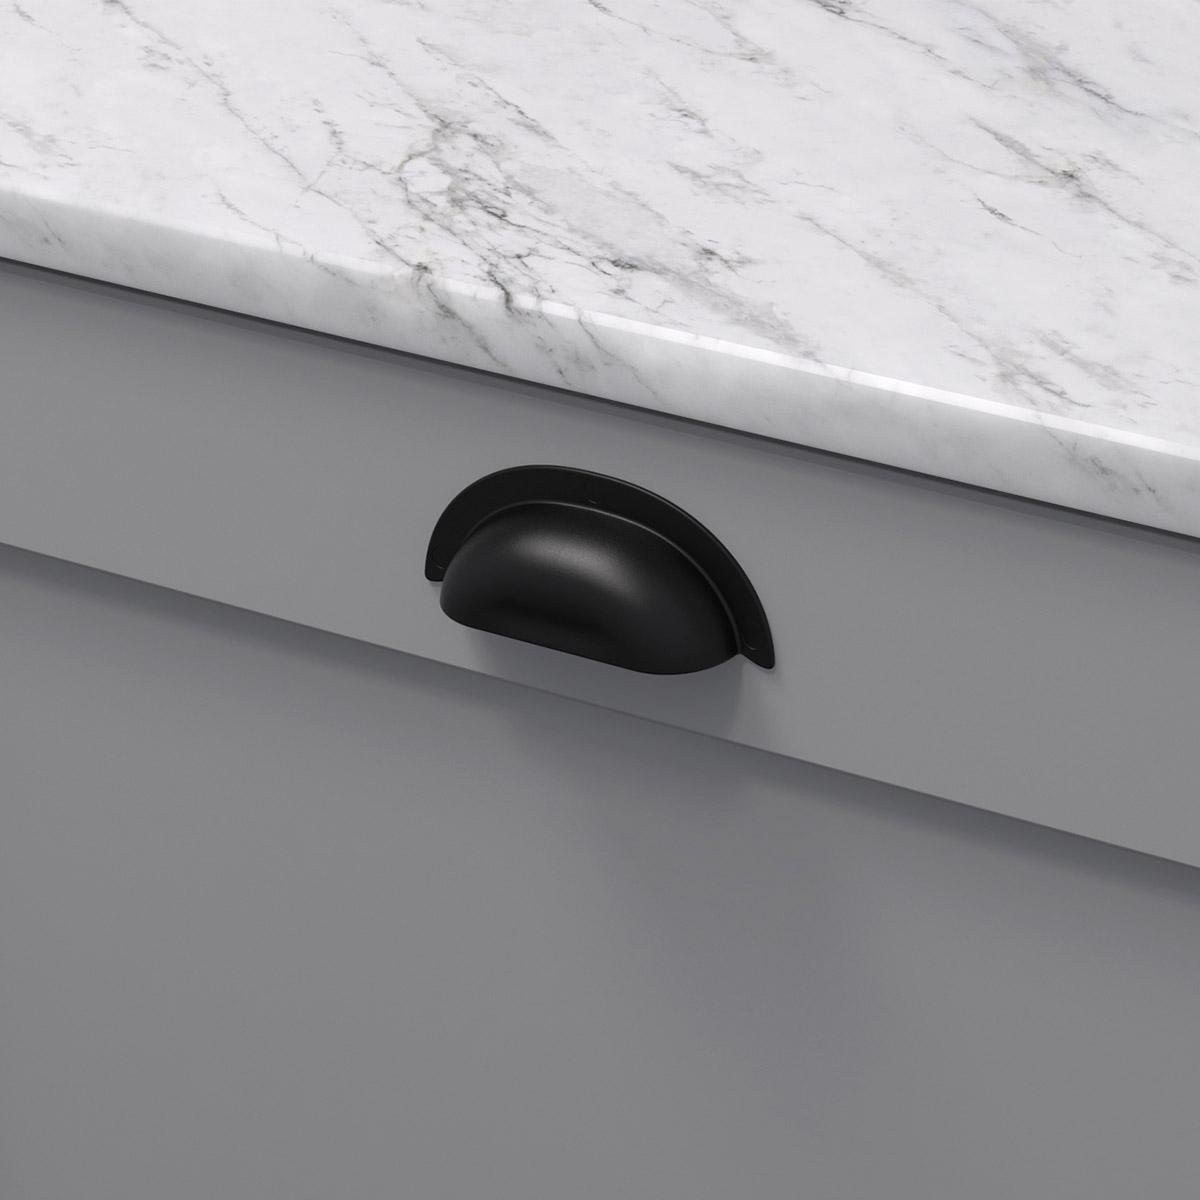 Skålhand 3922 antik svart 39224 11 ncs s 4500 n marmor carrara